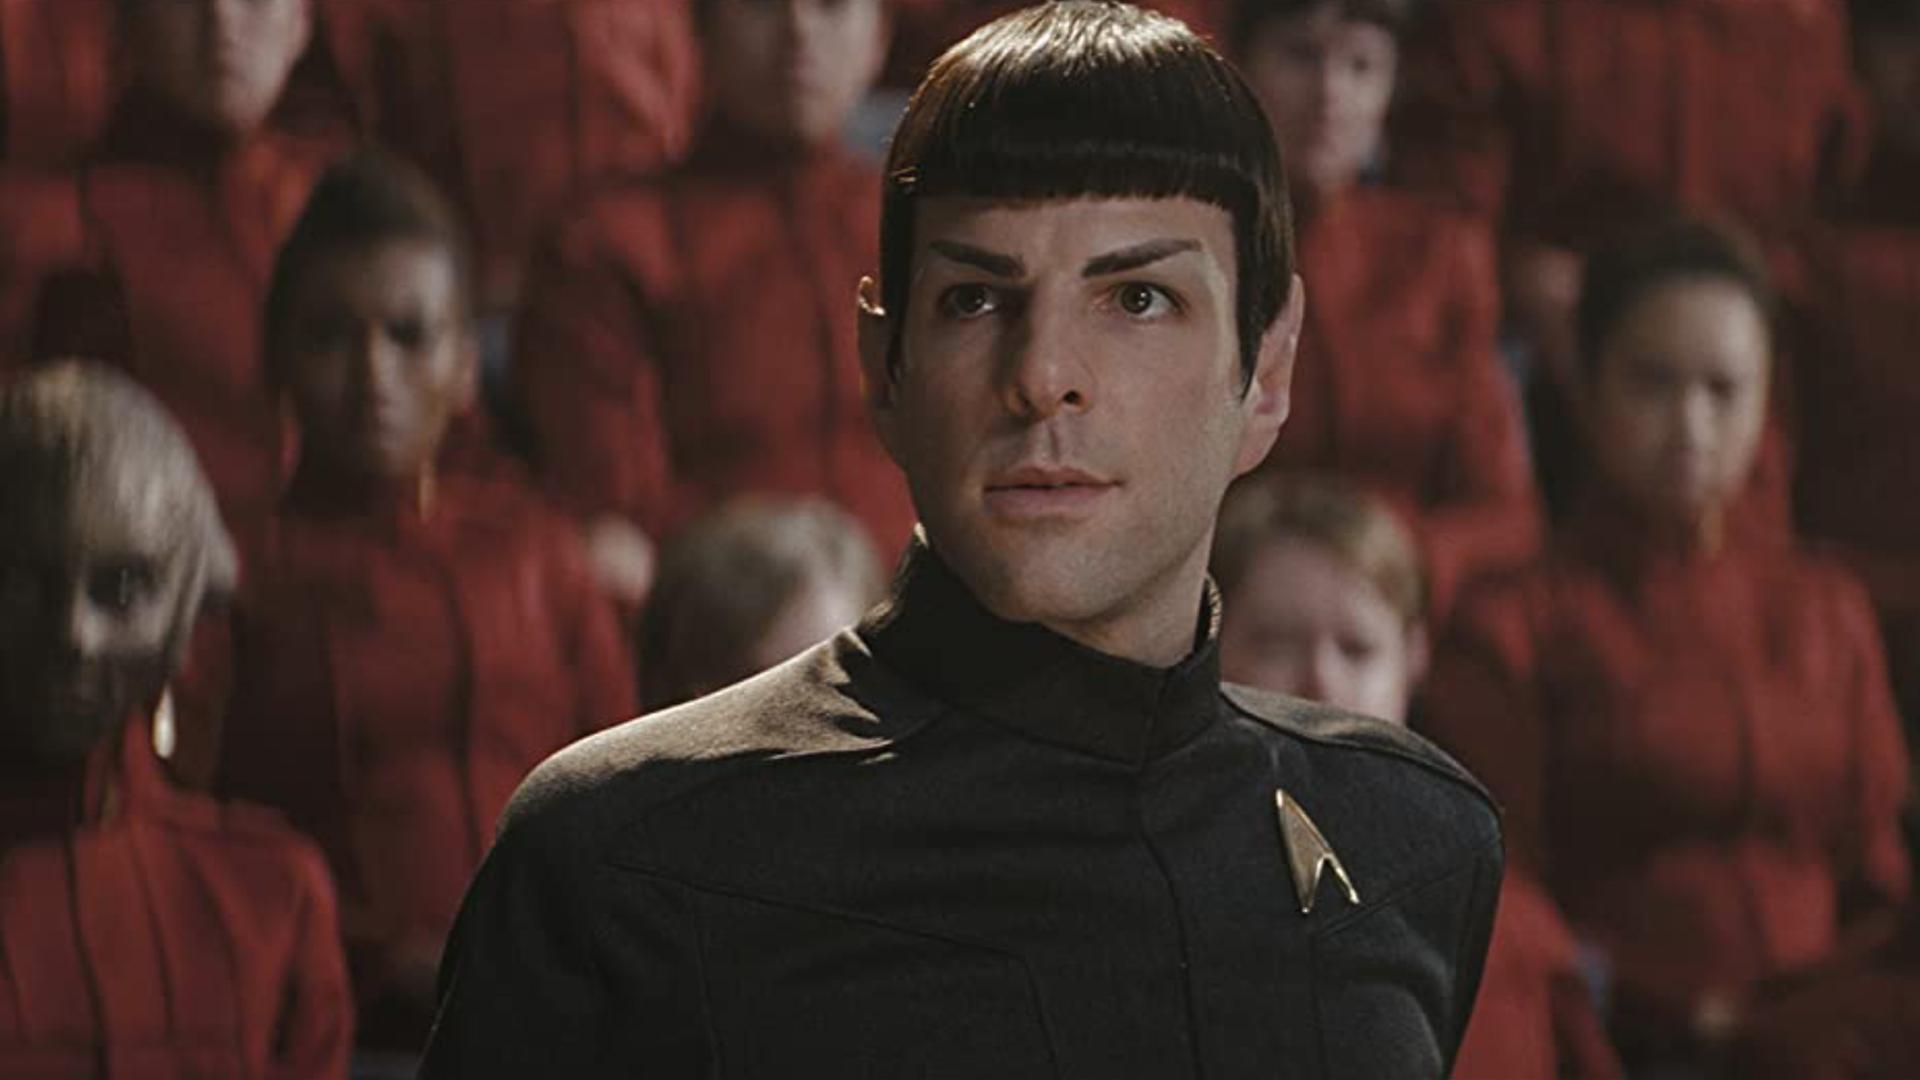 Star Trek movies in chronological order